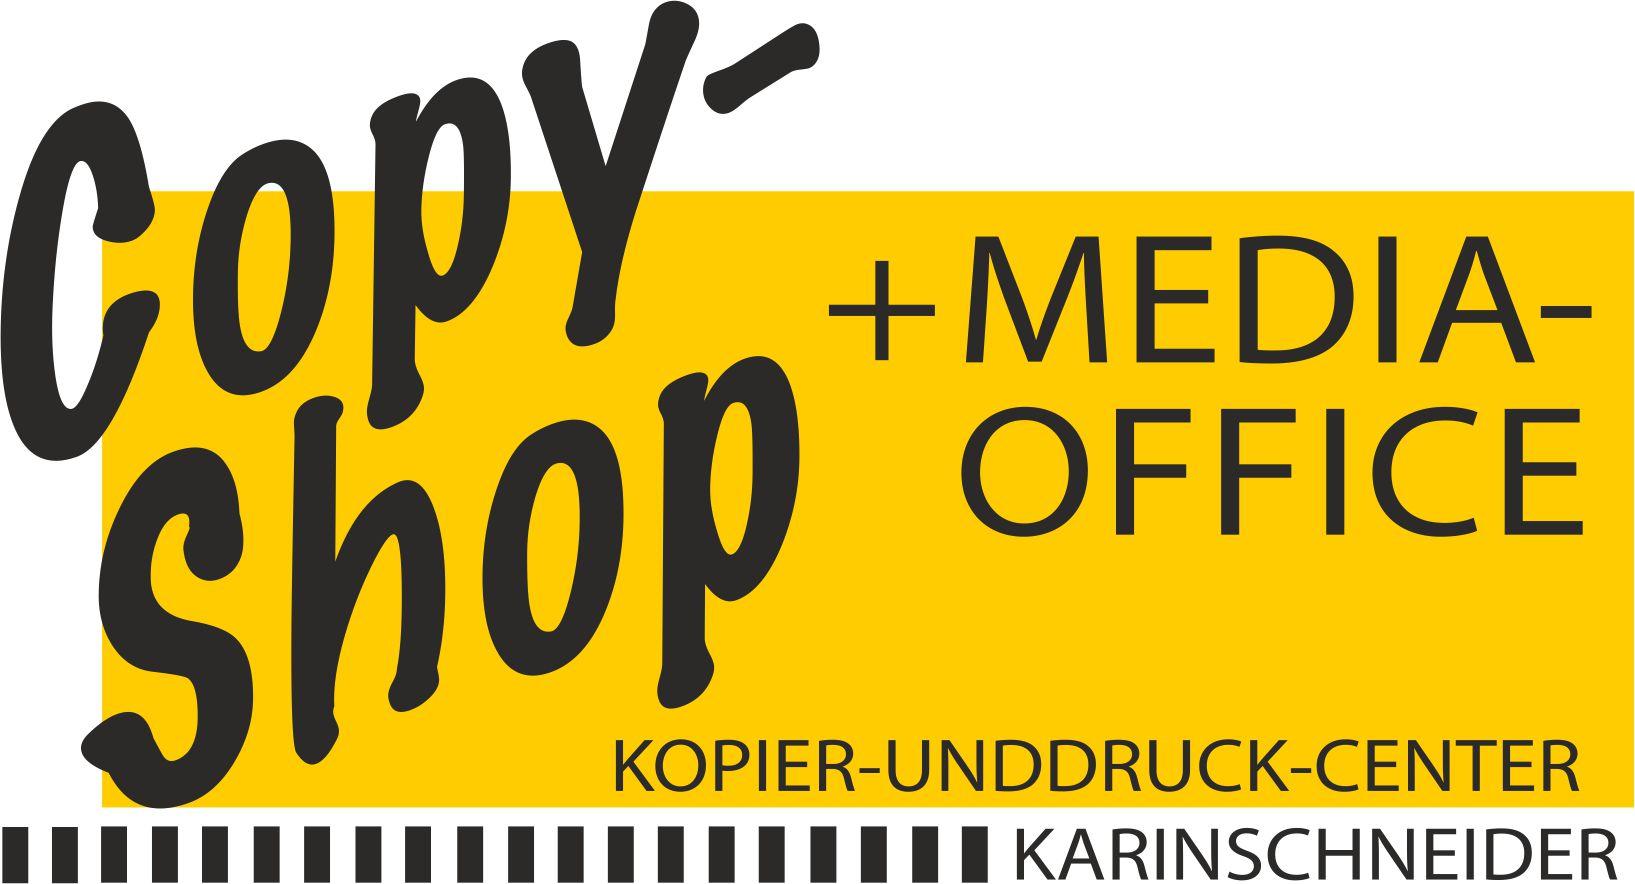 Copy-Shop + Media-Office Karin Schneider